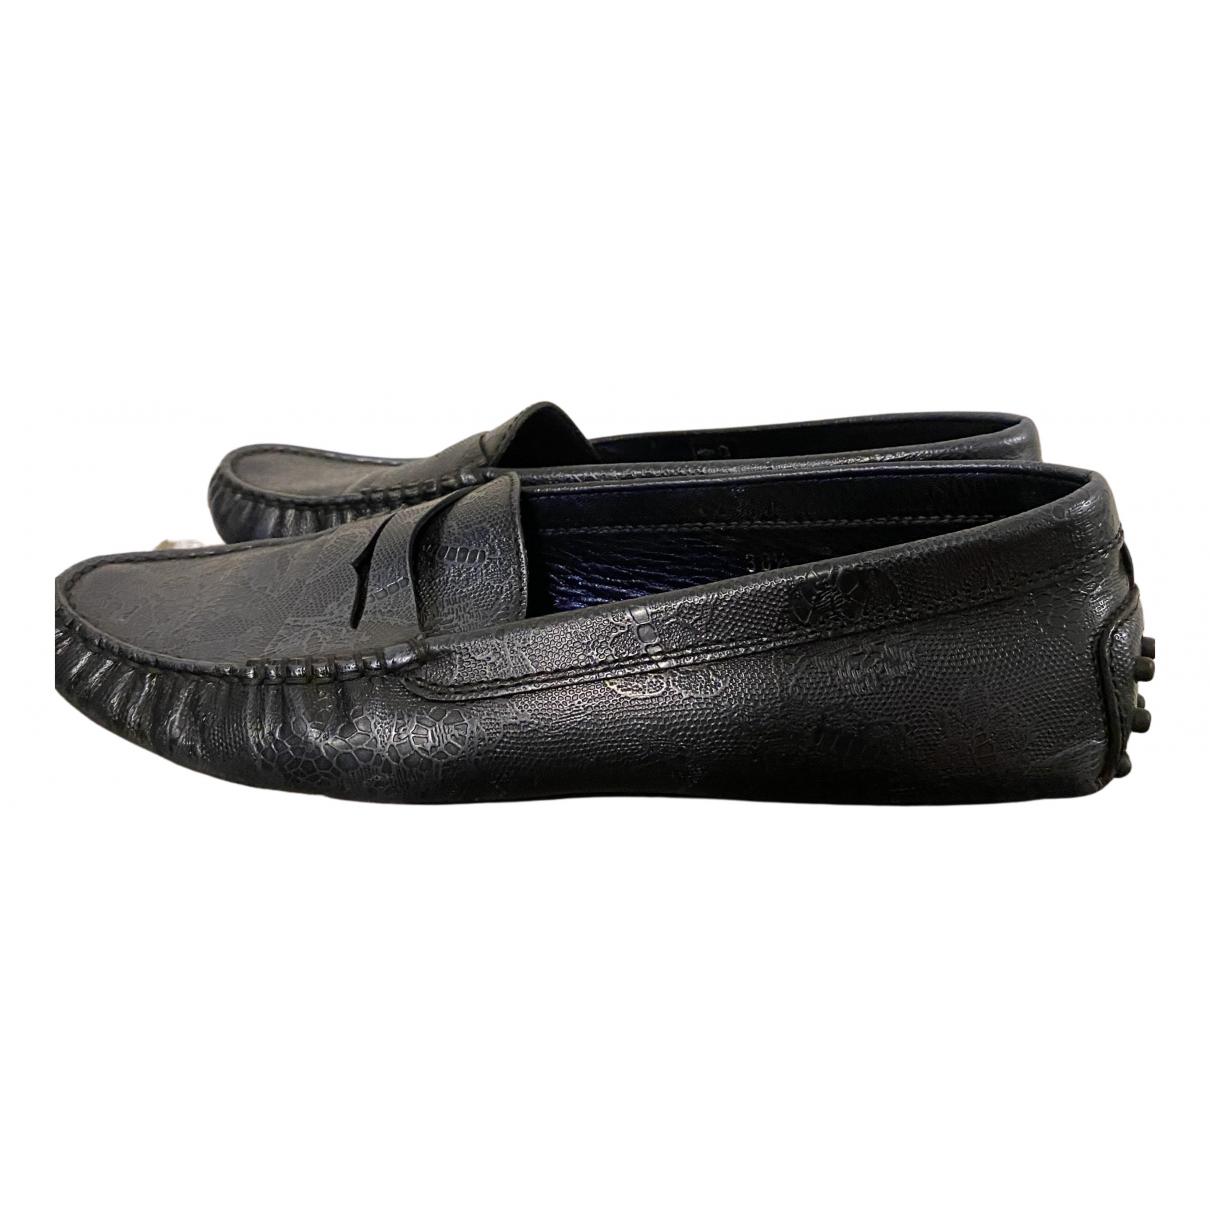 Tod's Gommino Metallic Leather Flats for Women 38.5 EU